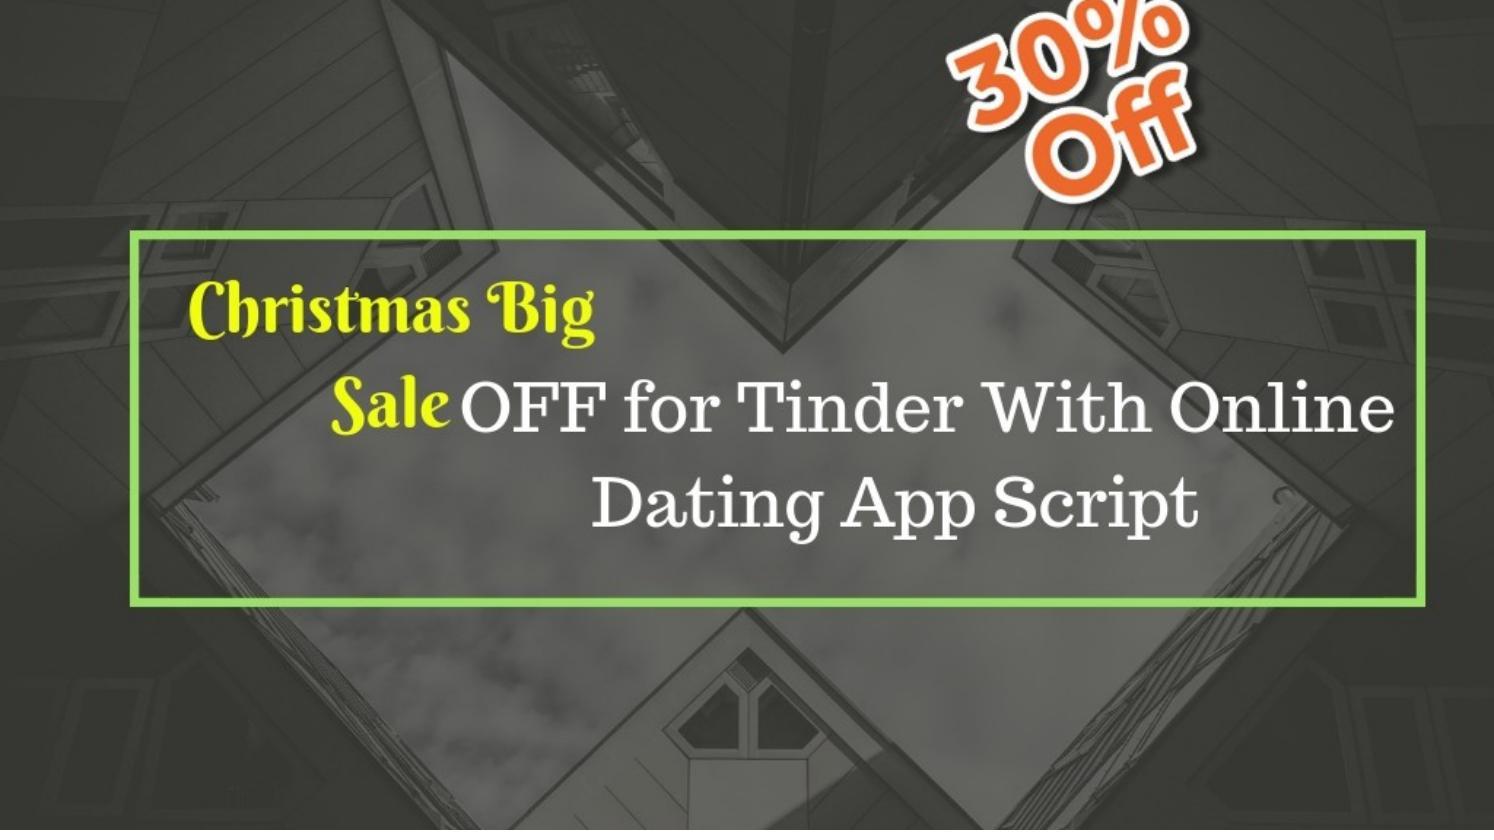 online dating Christmas moderne metoder for dating